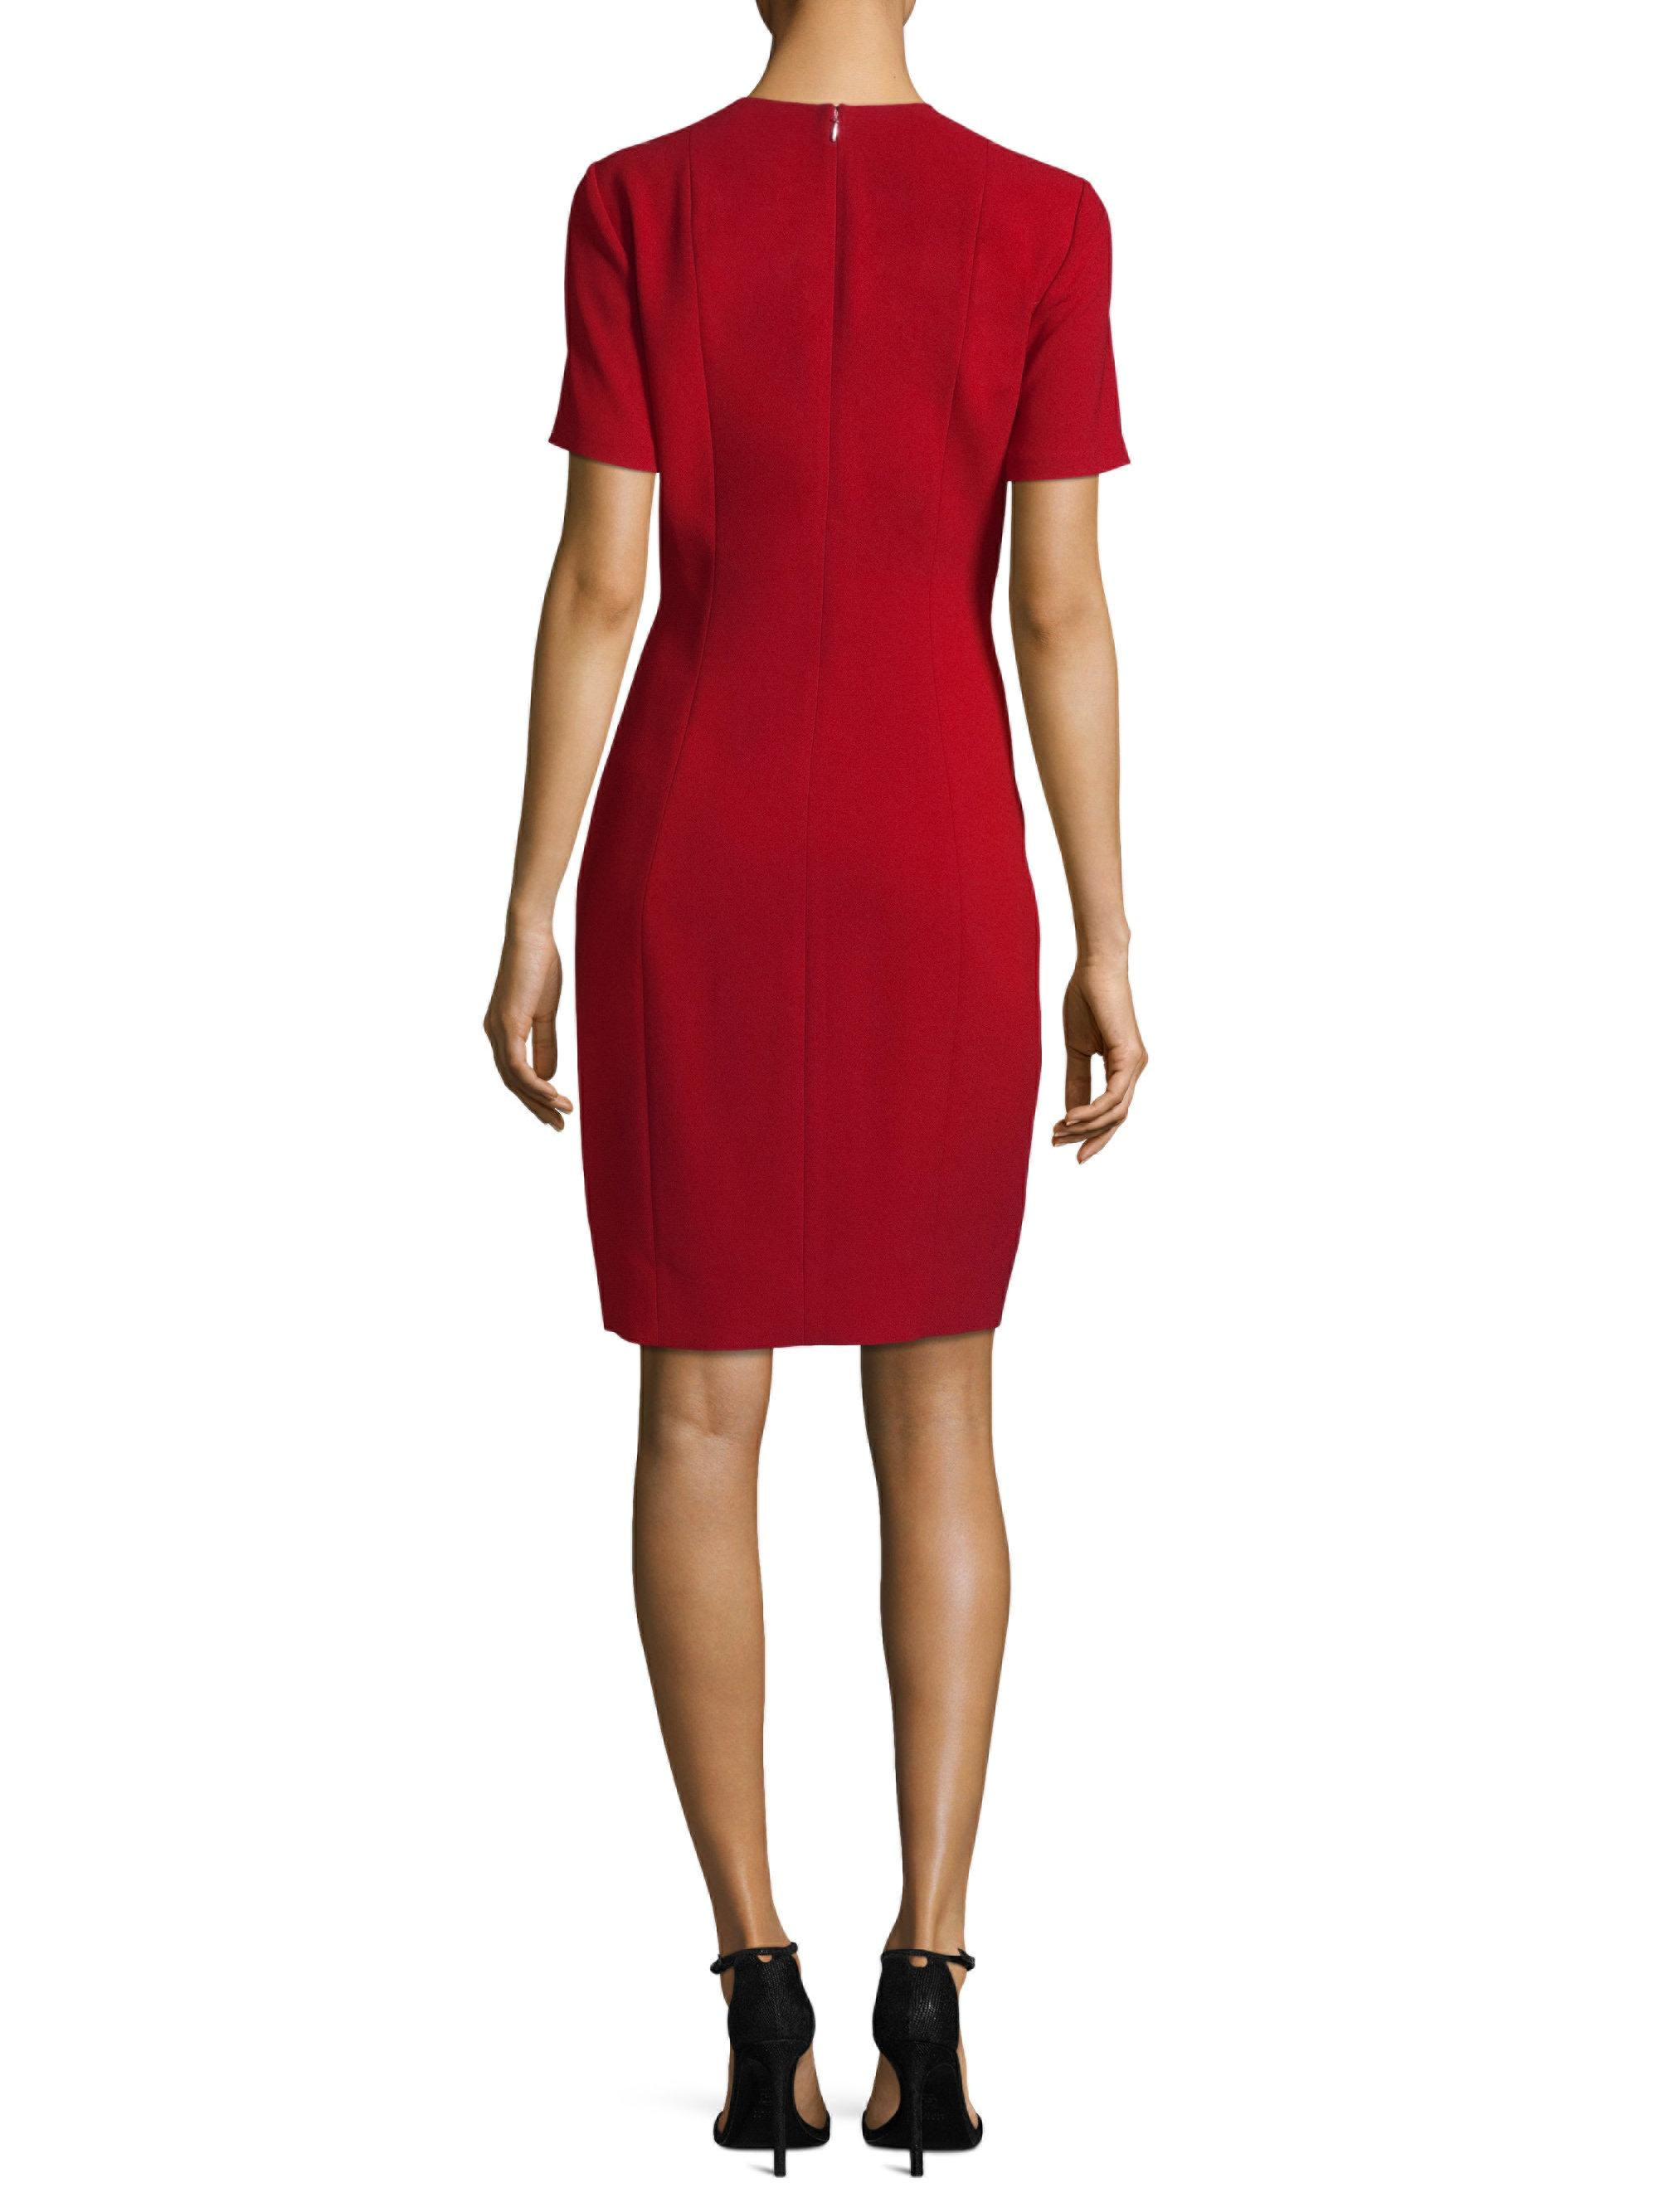 Elie tahari roanna dress satin sheath dress in red lyst for Saks fifth avenue wedding guest dresses